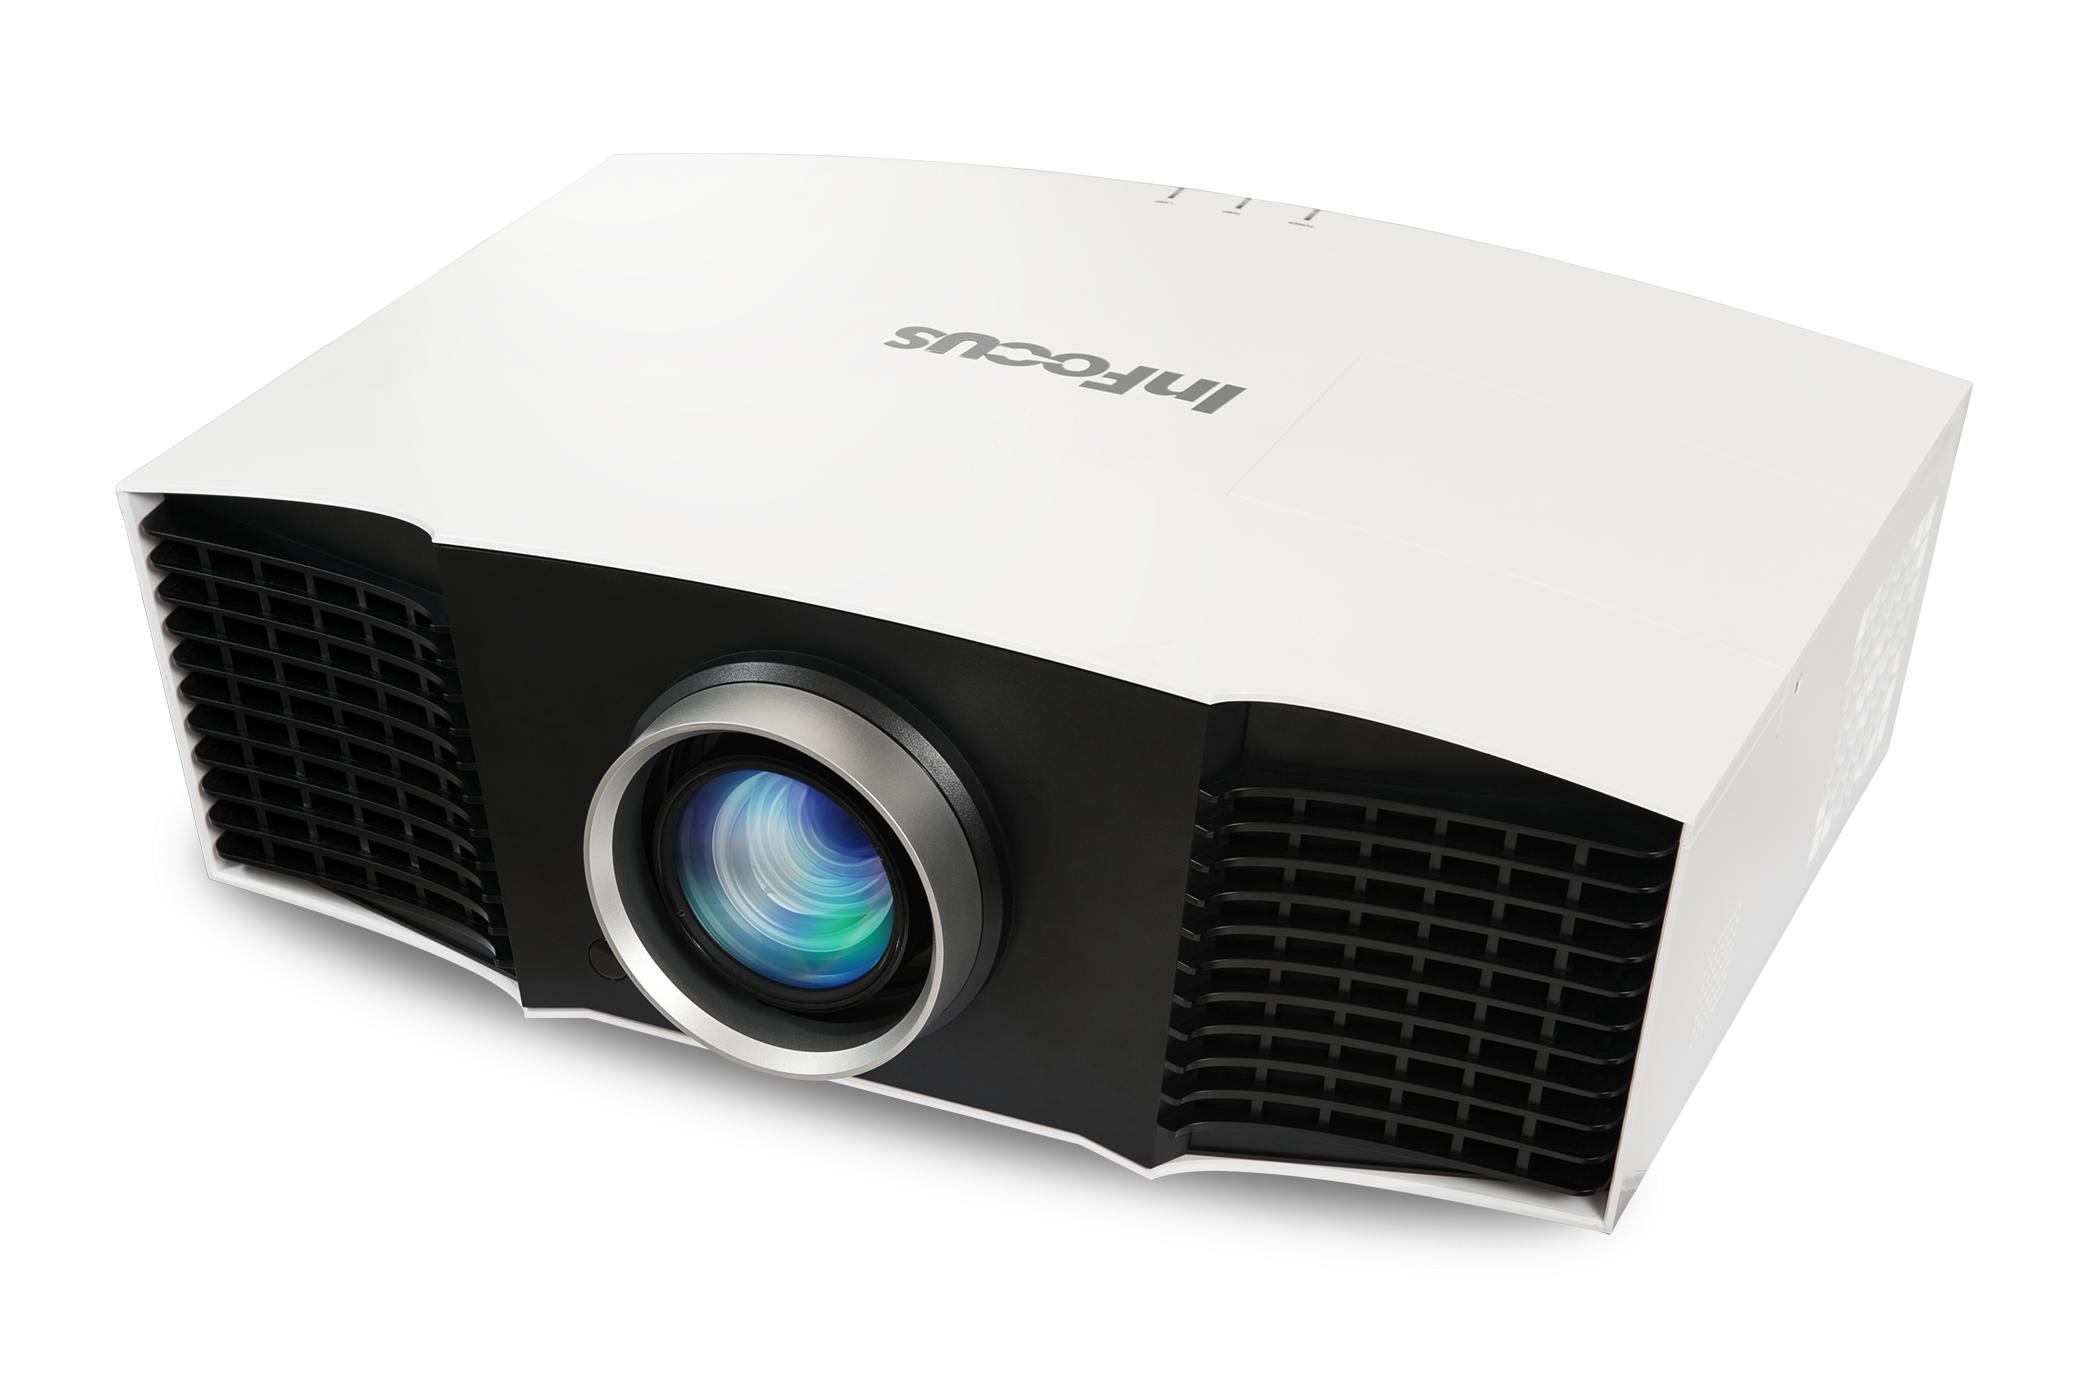 Vidéoprojecteur Full HD - 5000 Lumens - INFOCUS in5148hd